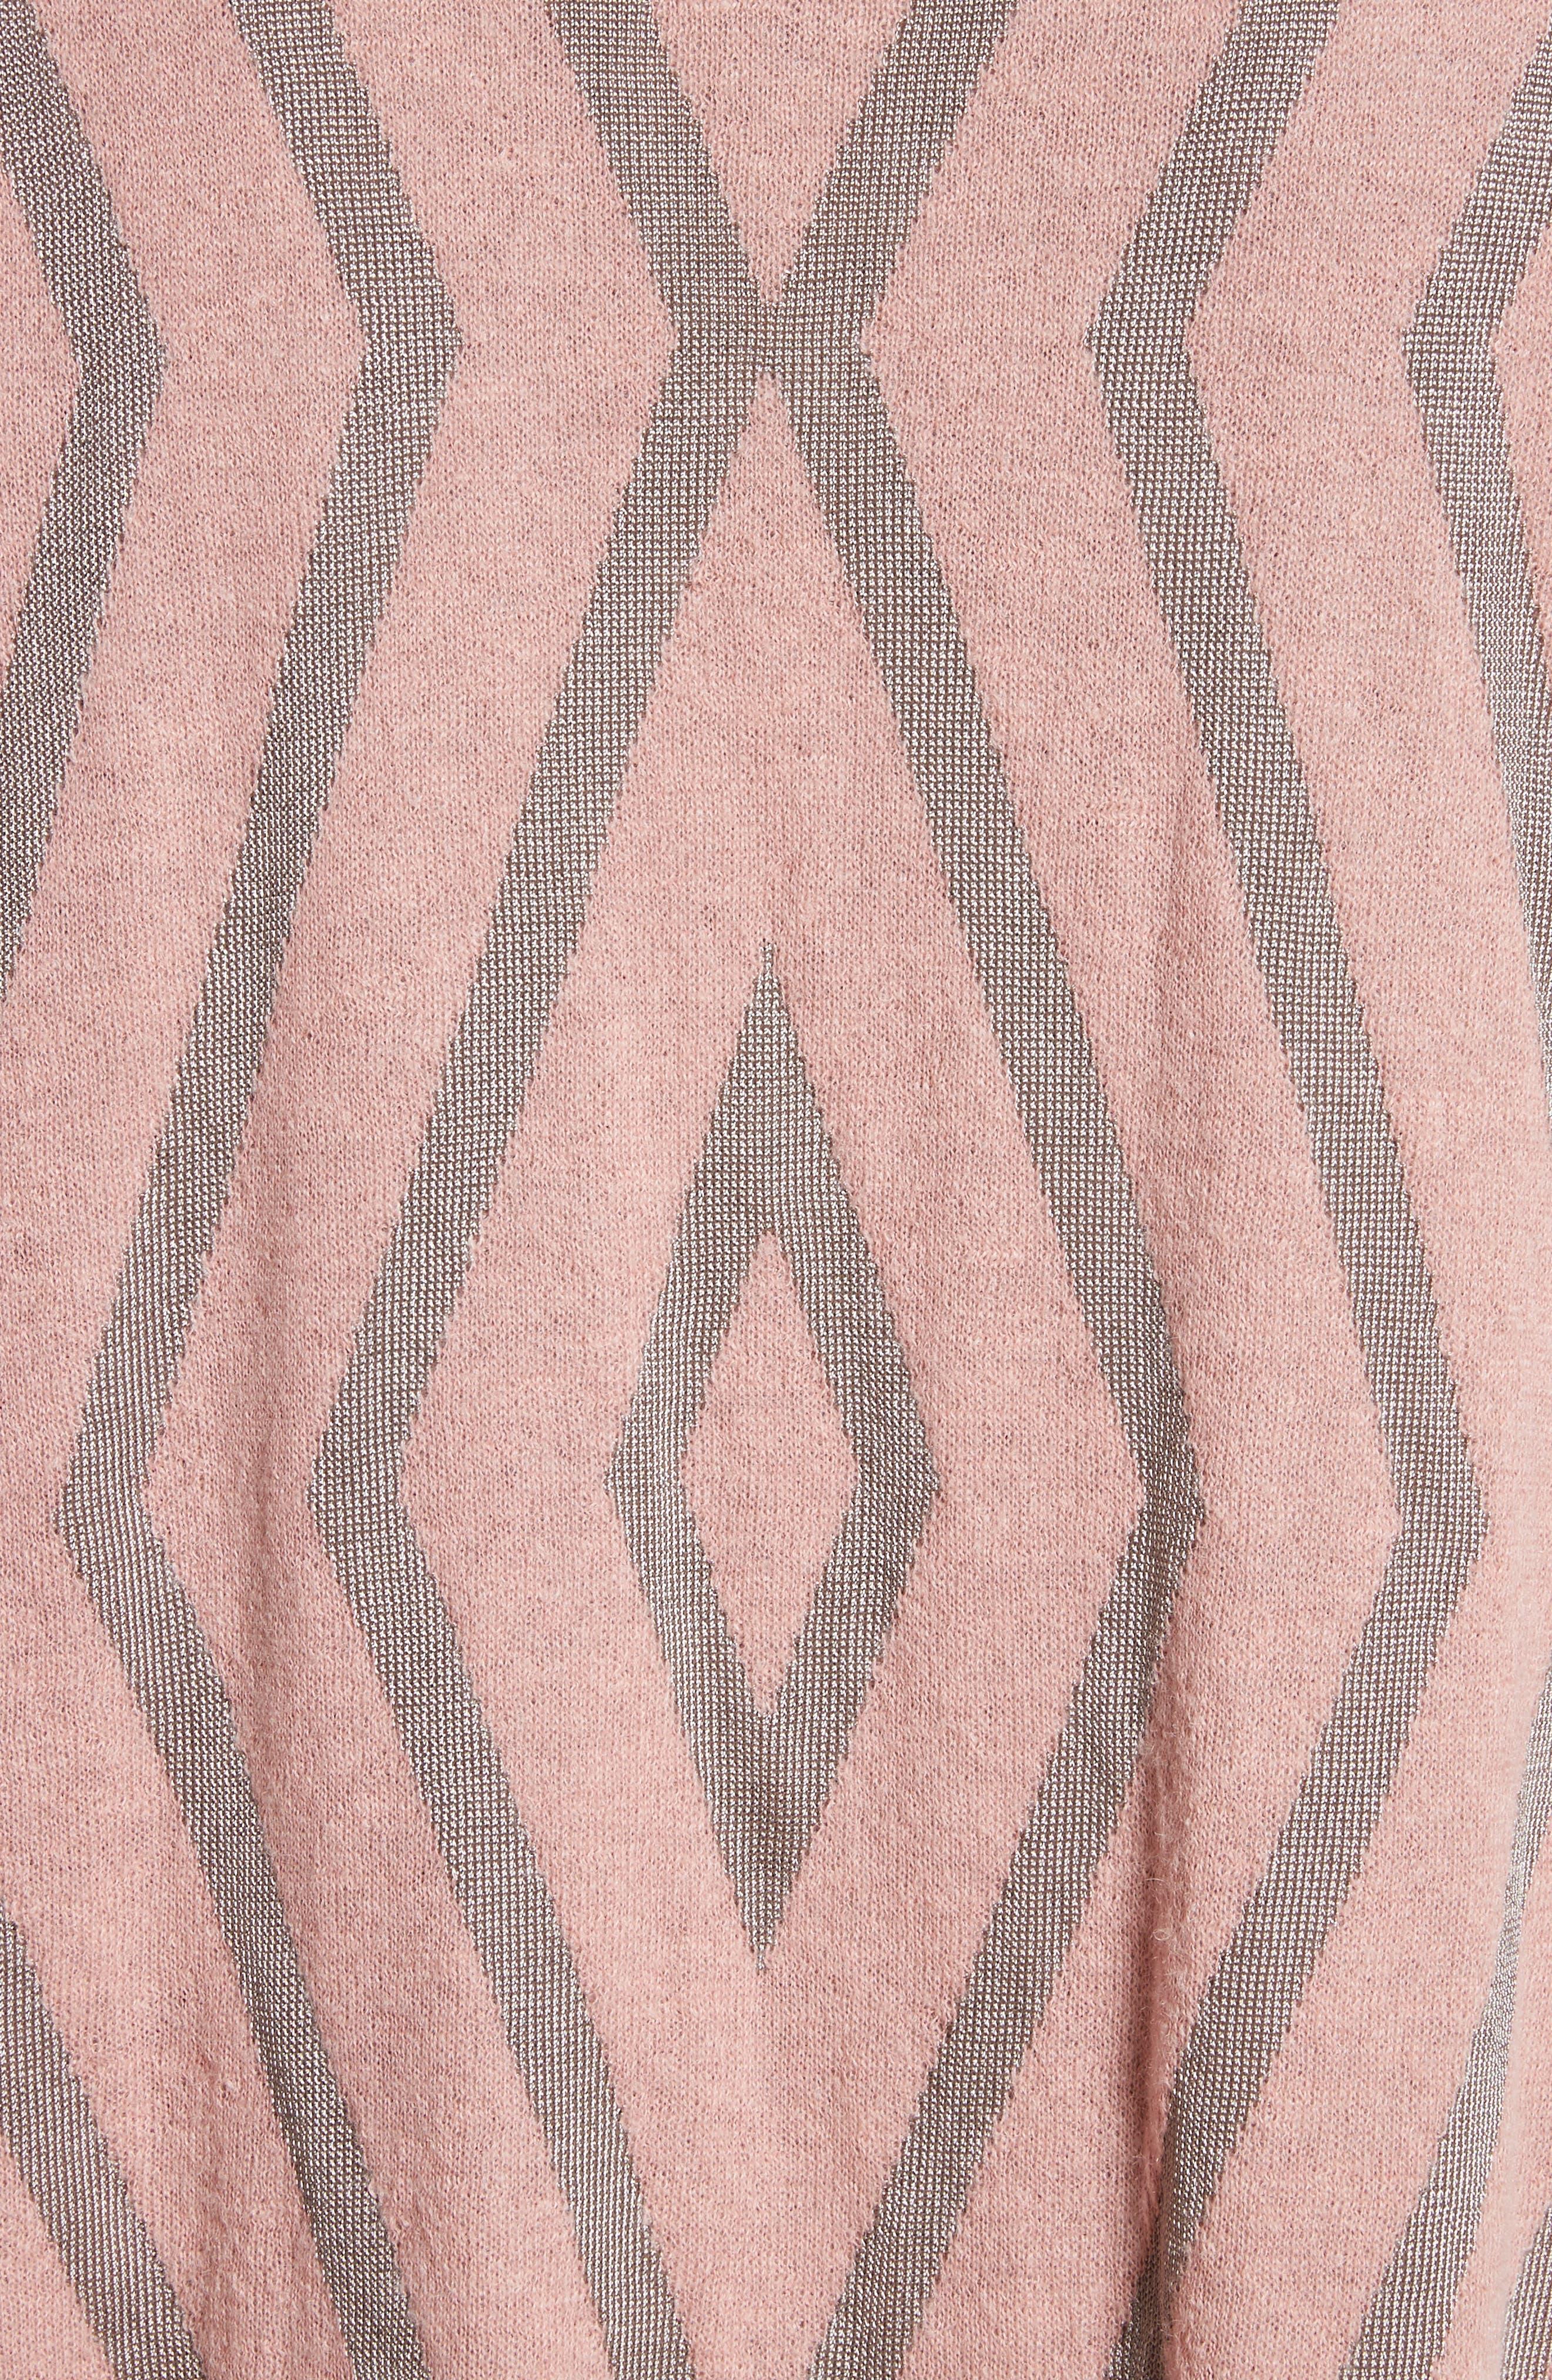 Alternate Image 5  - St. John Collection Matte Shine Geo Jacquard Knit Cardigan